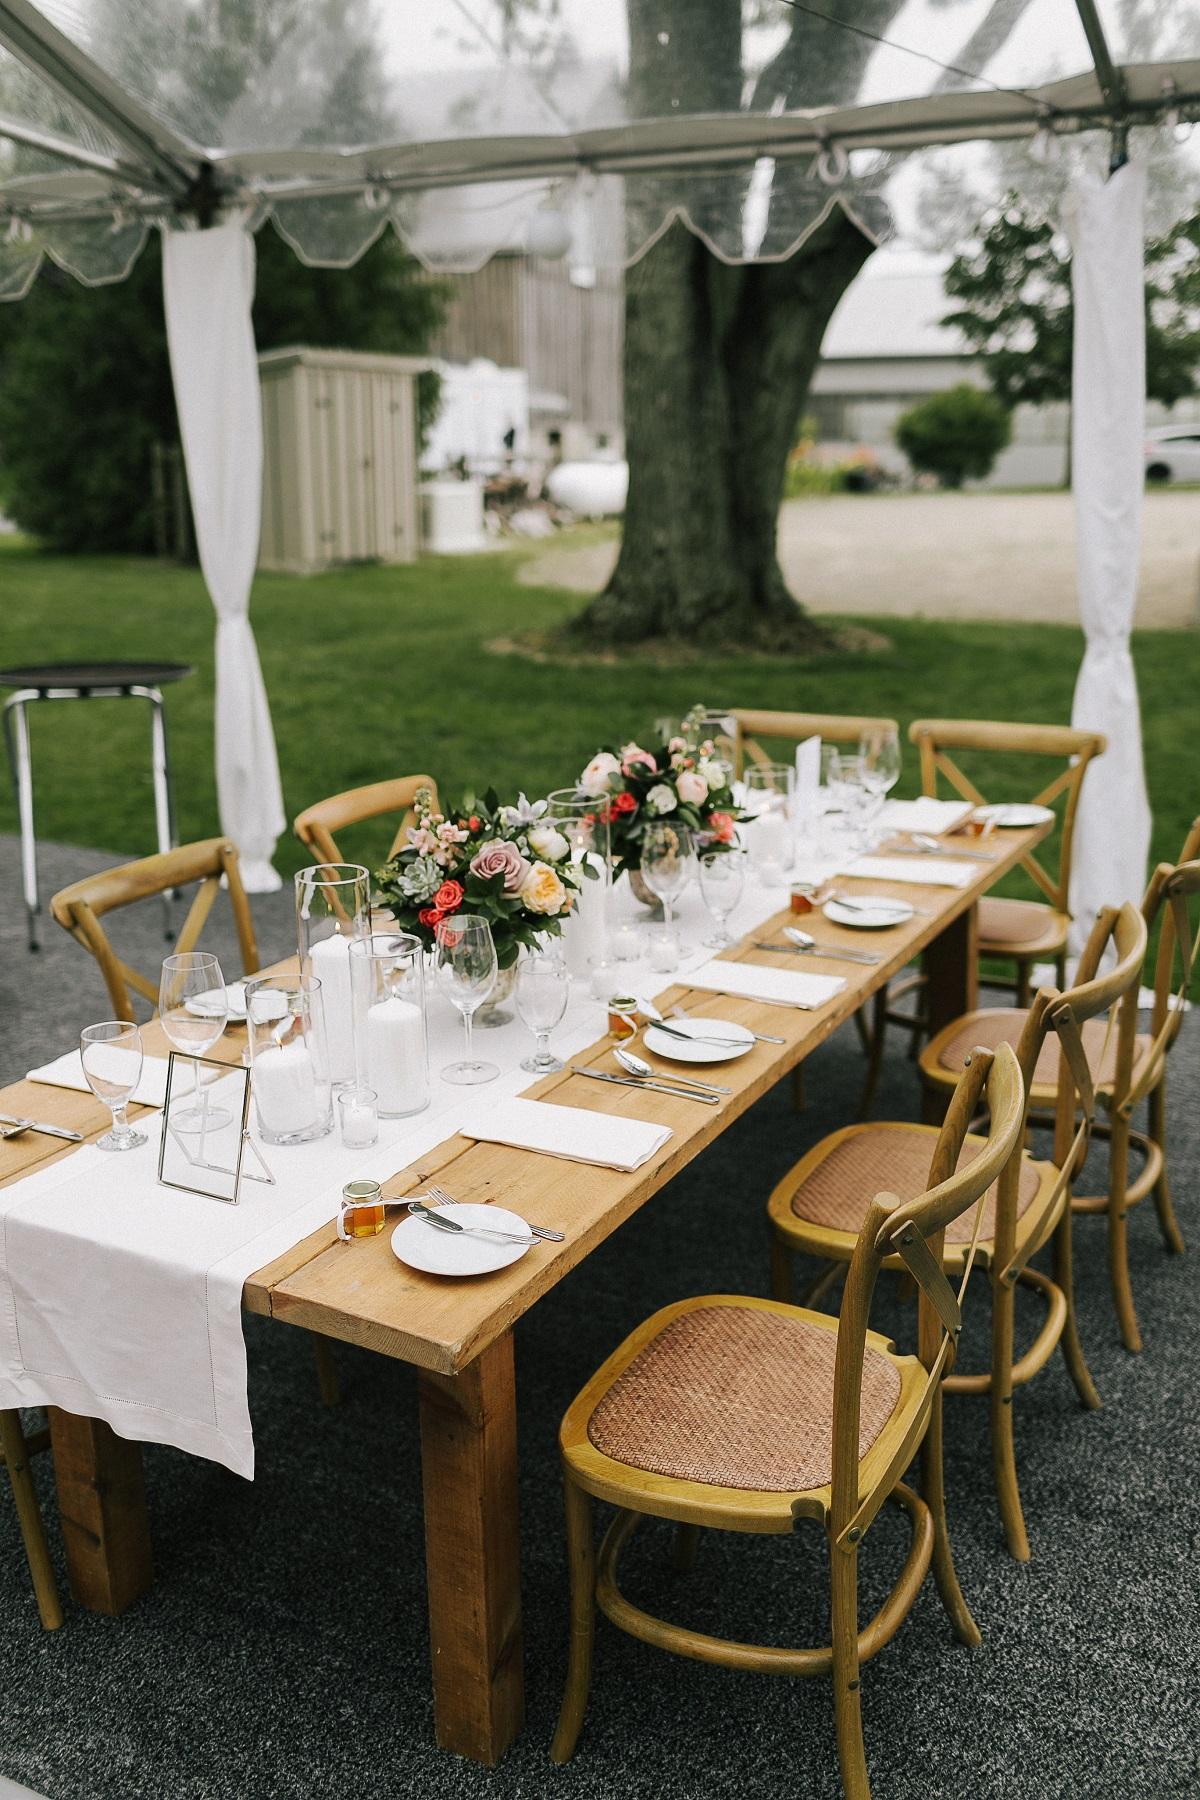 tented-wedding-planner-ancaster-kj-and-co 25.JPG